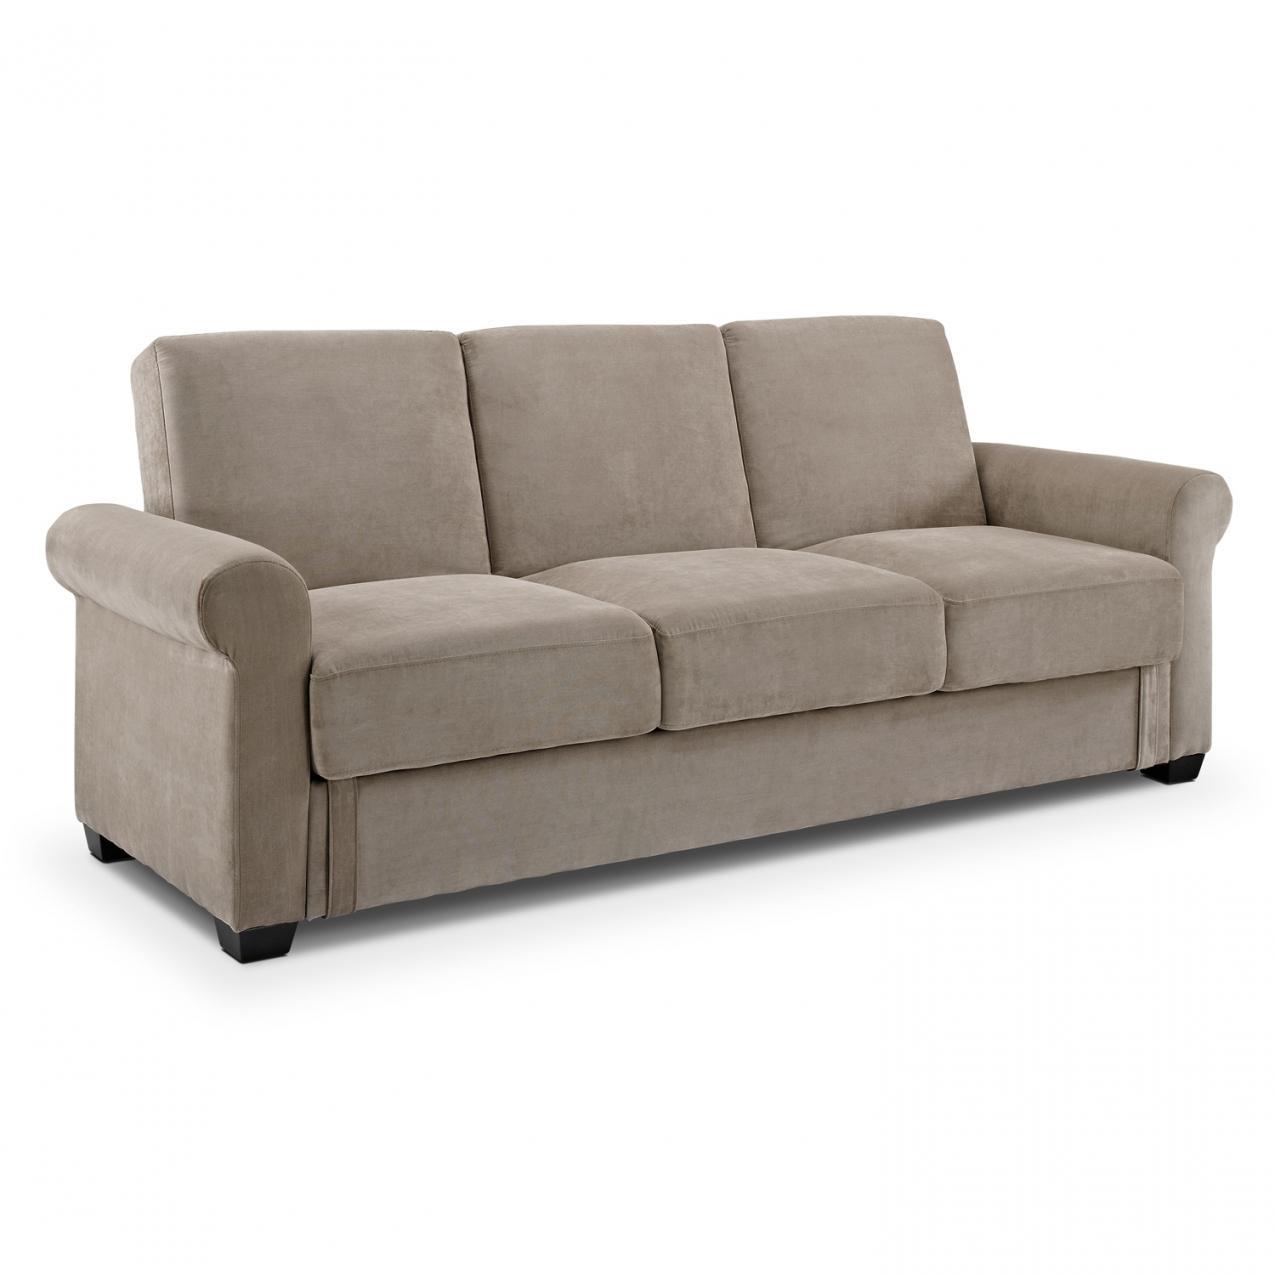 sears furniture sofas loveseat sofa bed kmart 20 best ideas